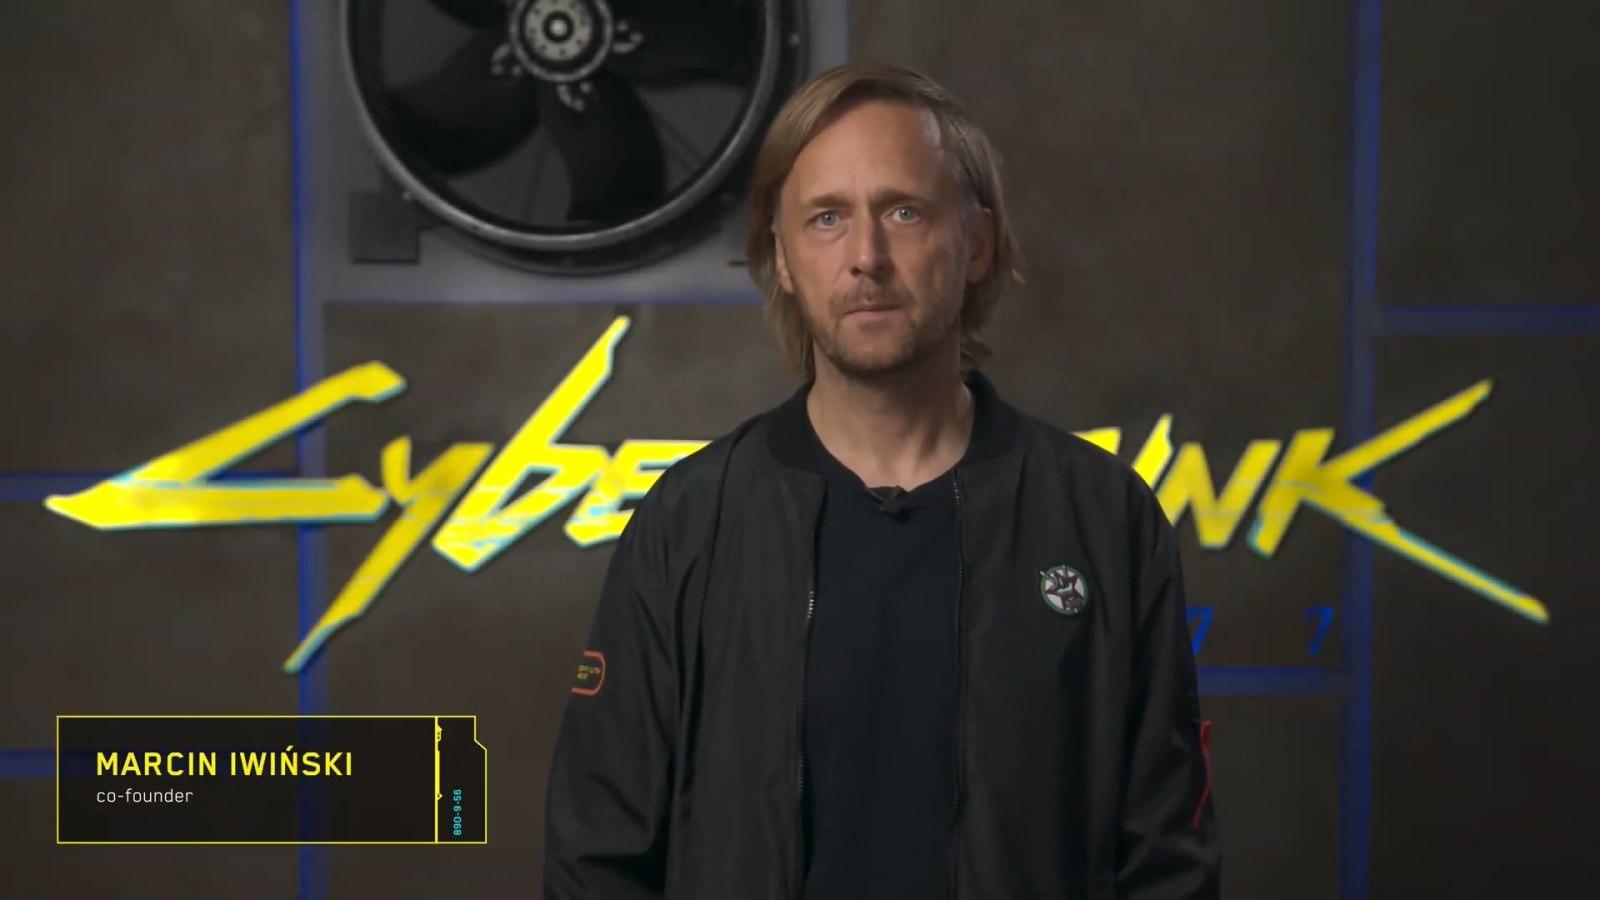 CD RPOJEKT联合创始人Marcin Iwiński发布《赛博朋克2077》情况说明视频